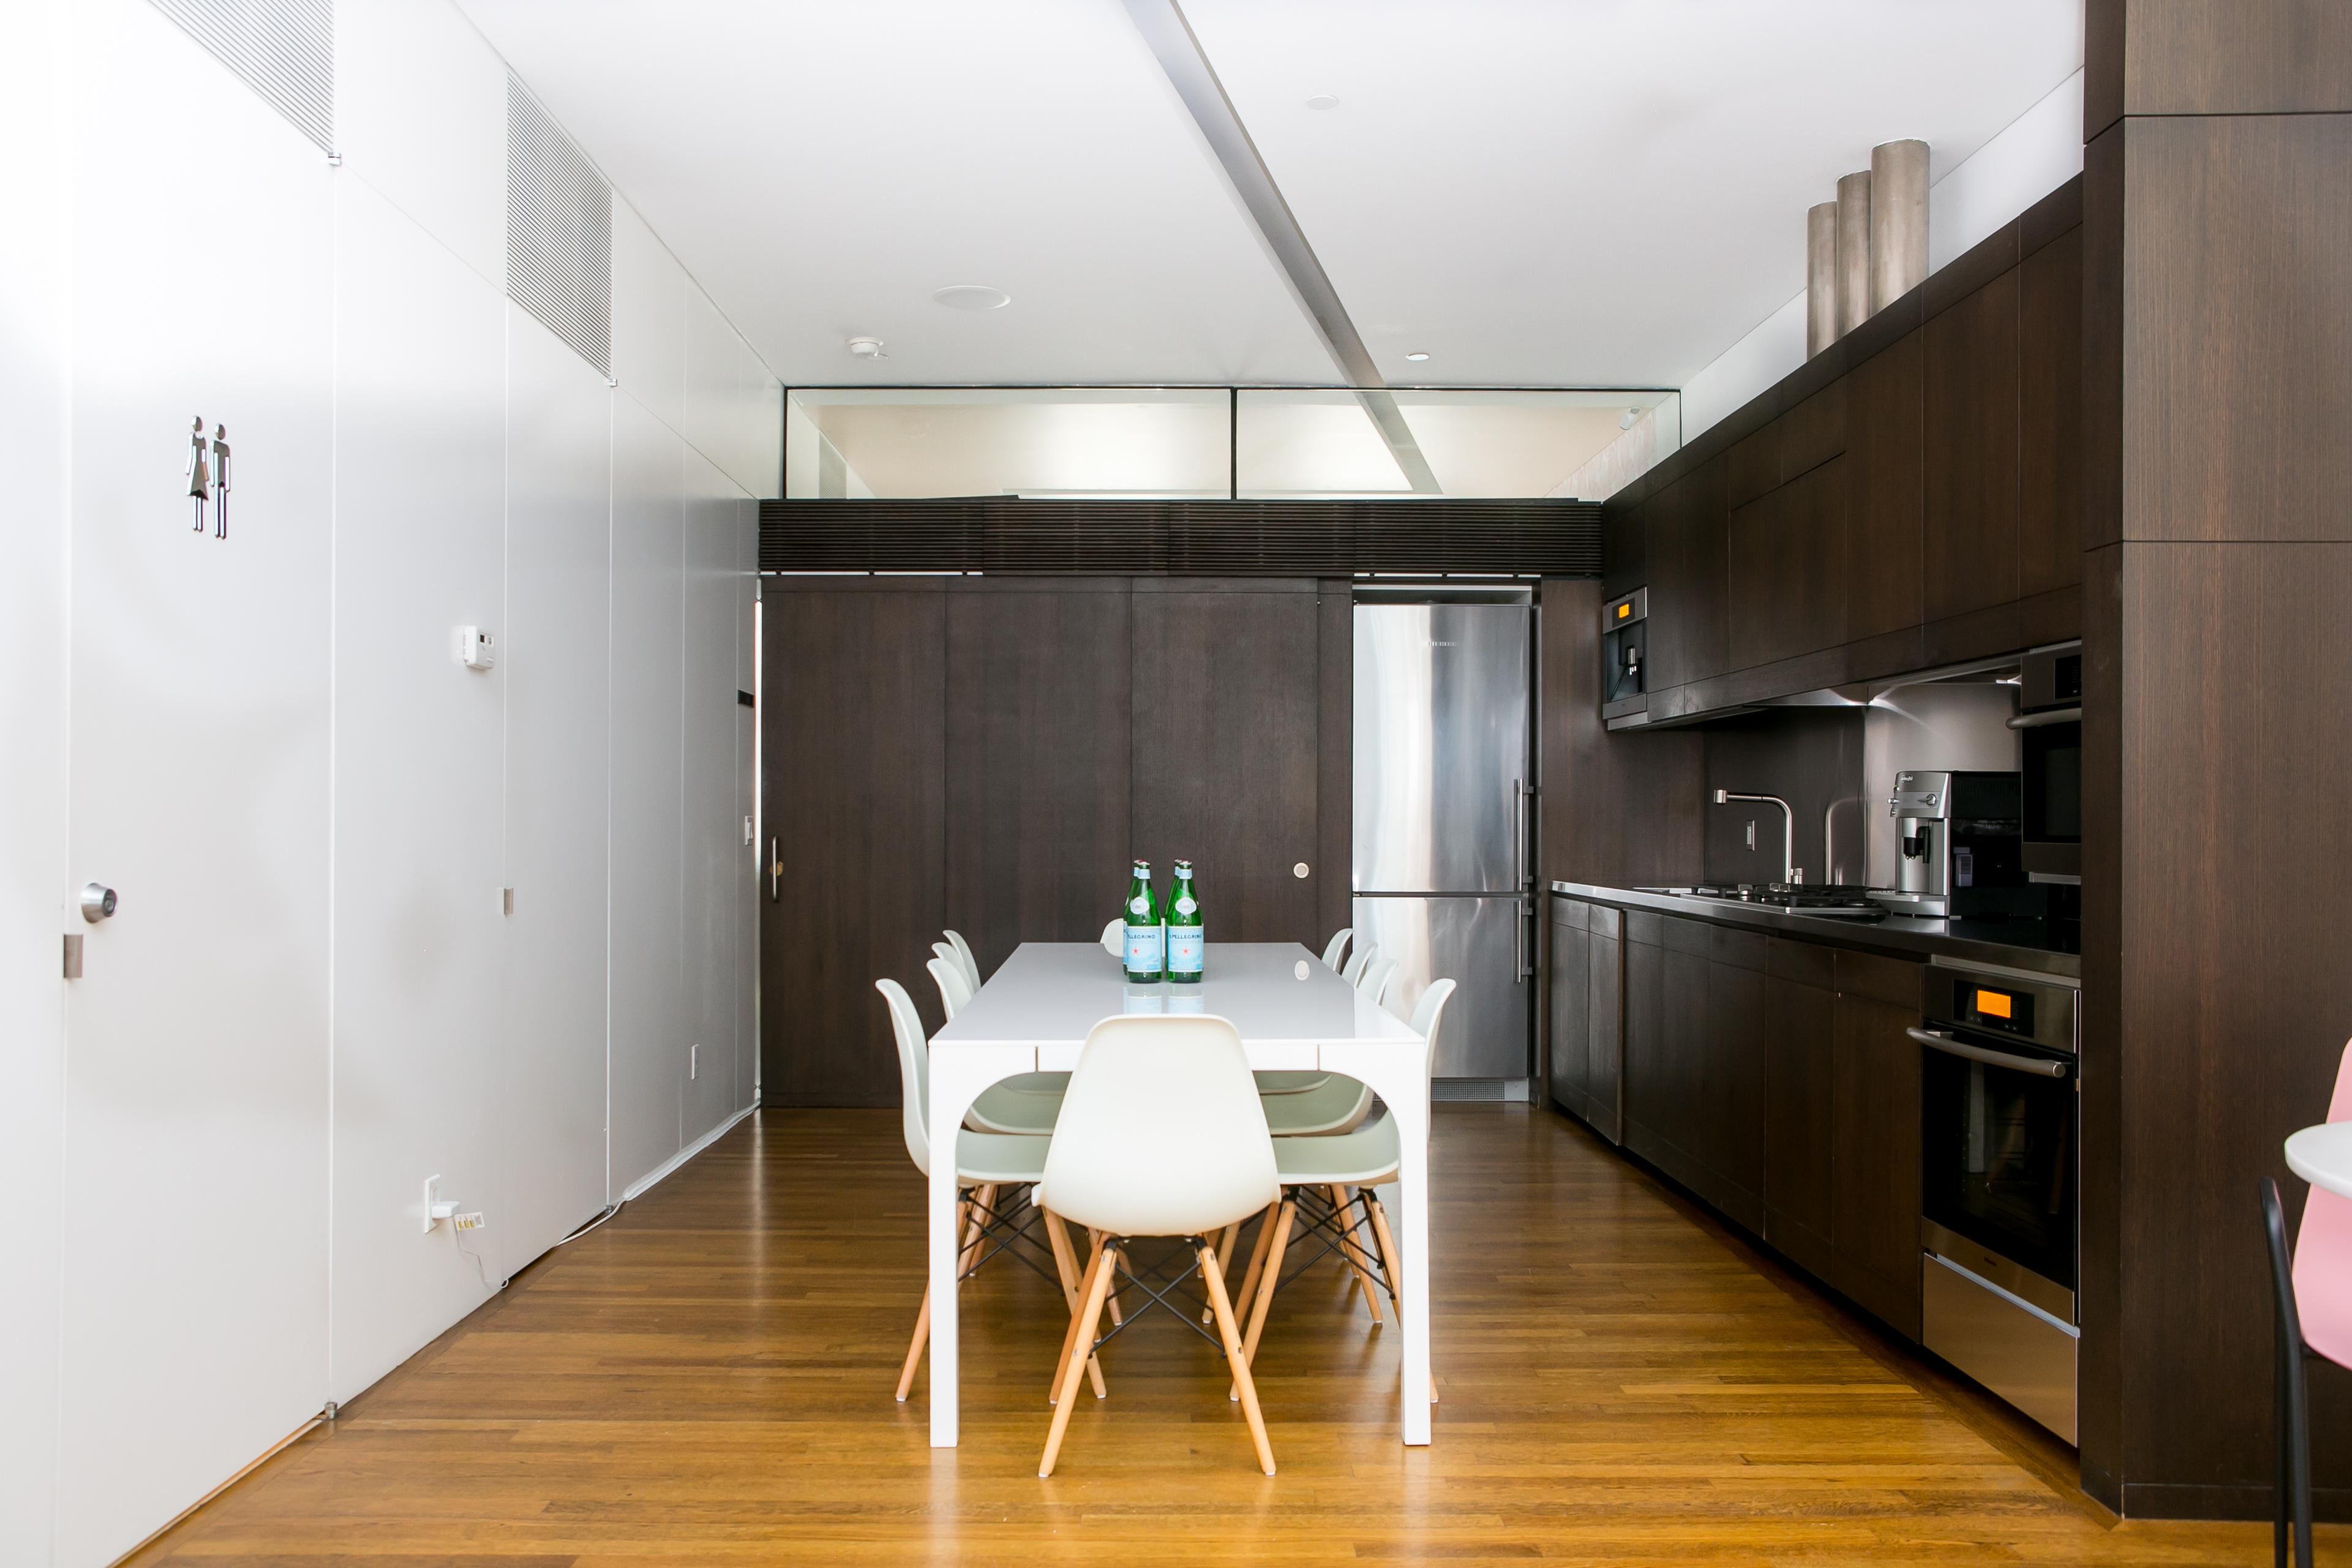 NYC interior photographer